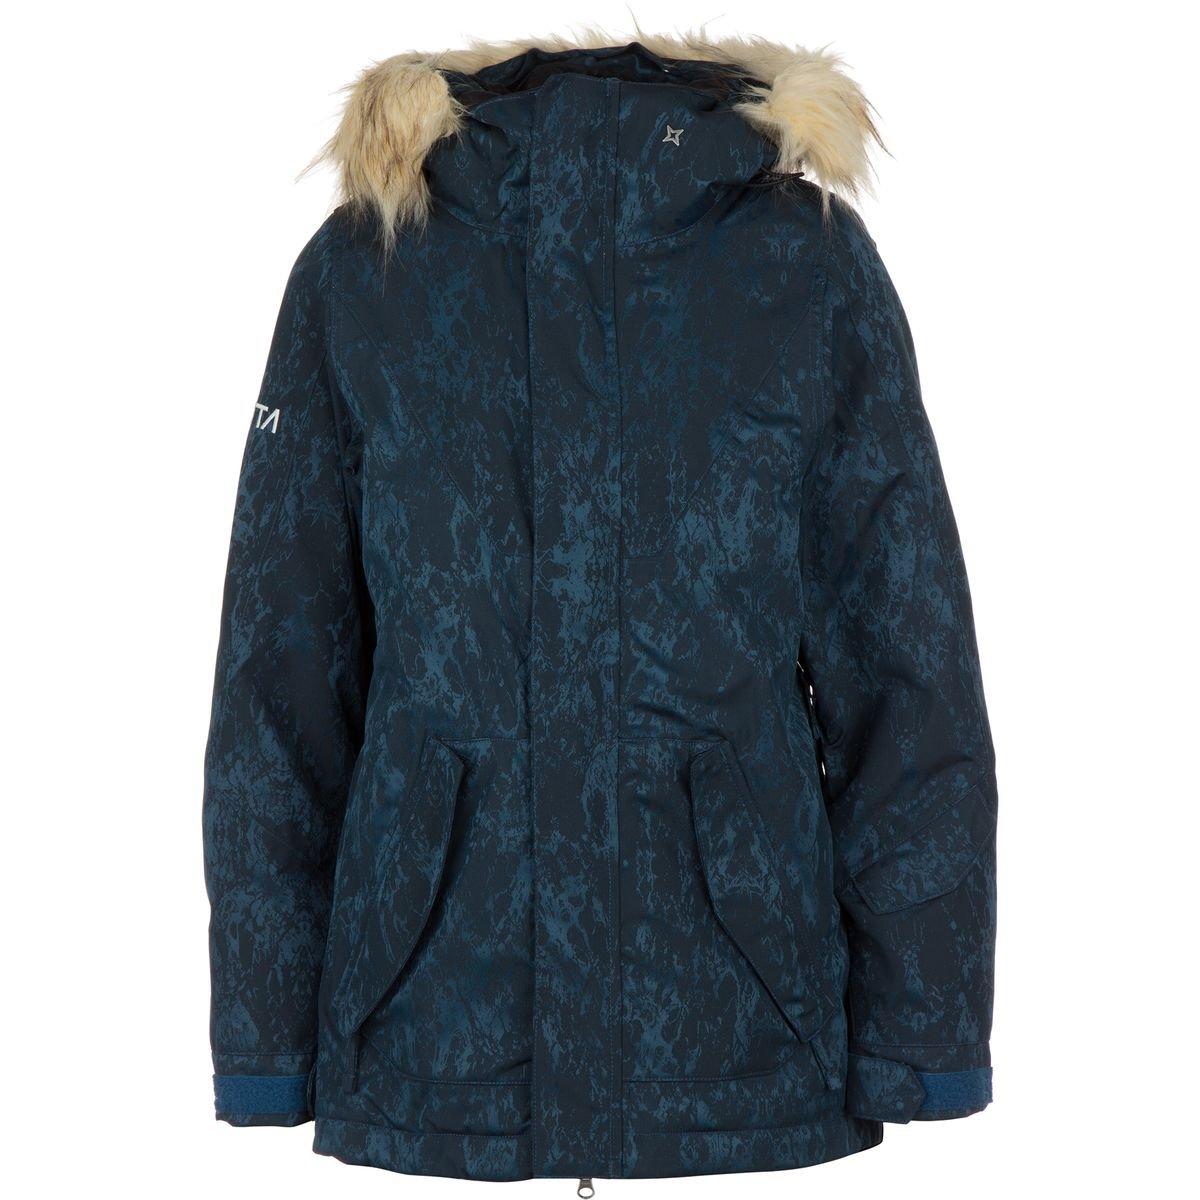 Damen Snowboard Jacke Nikita Freyja Jacquard Jacket günstig bestellen